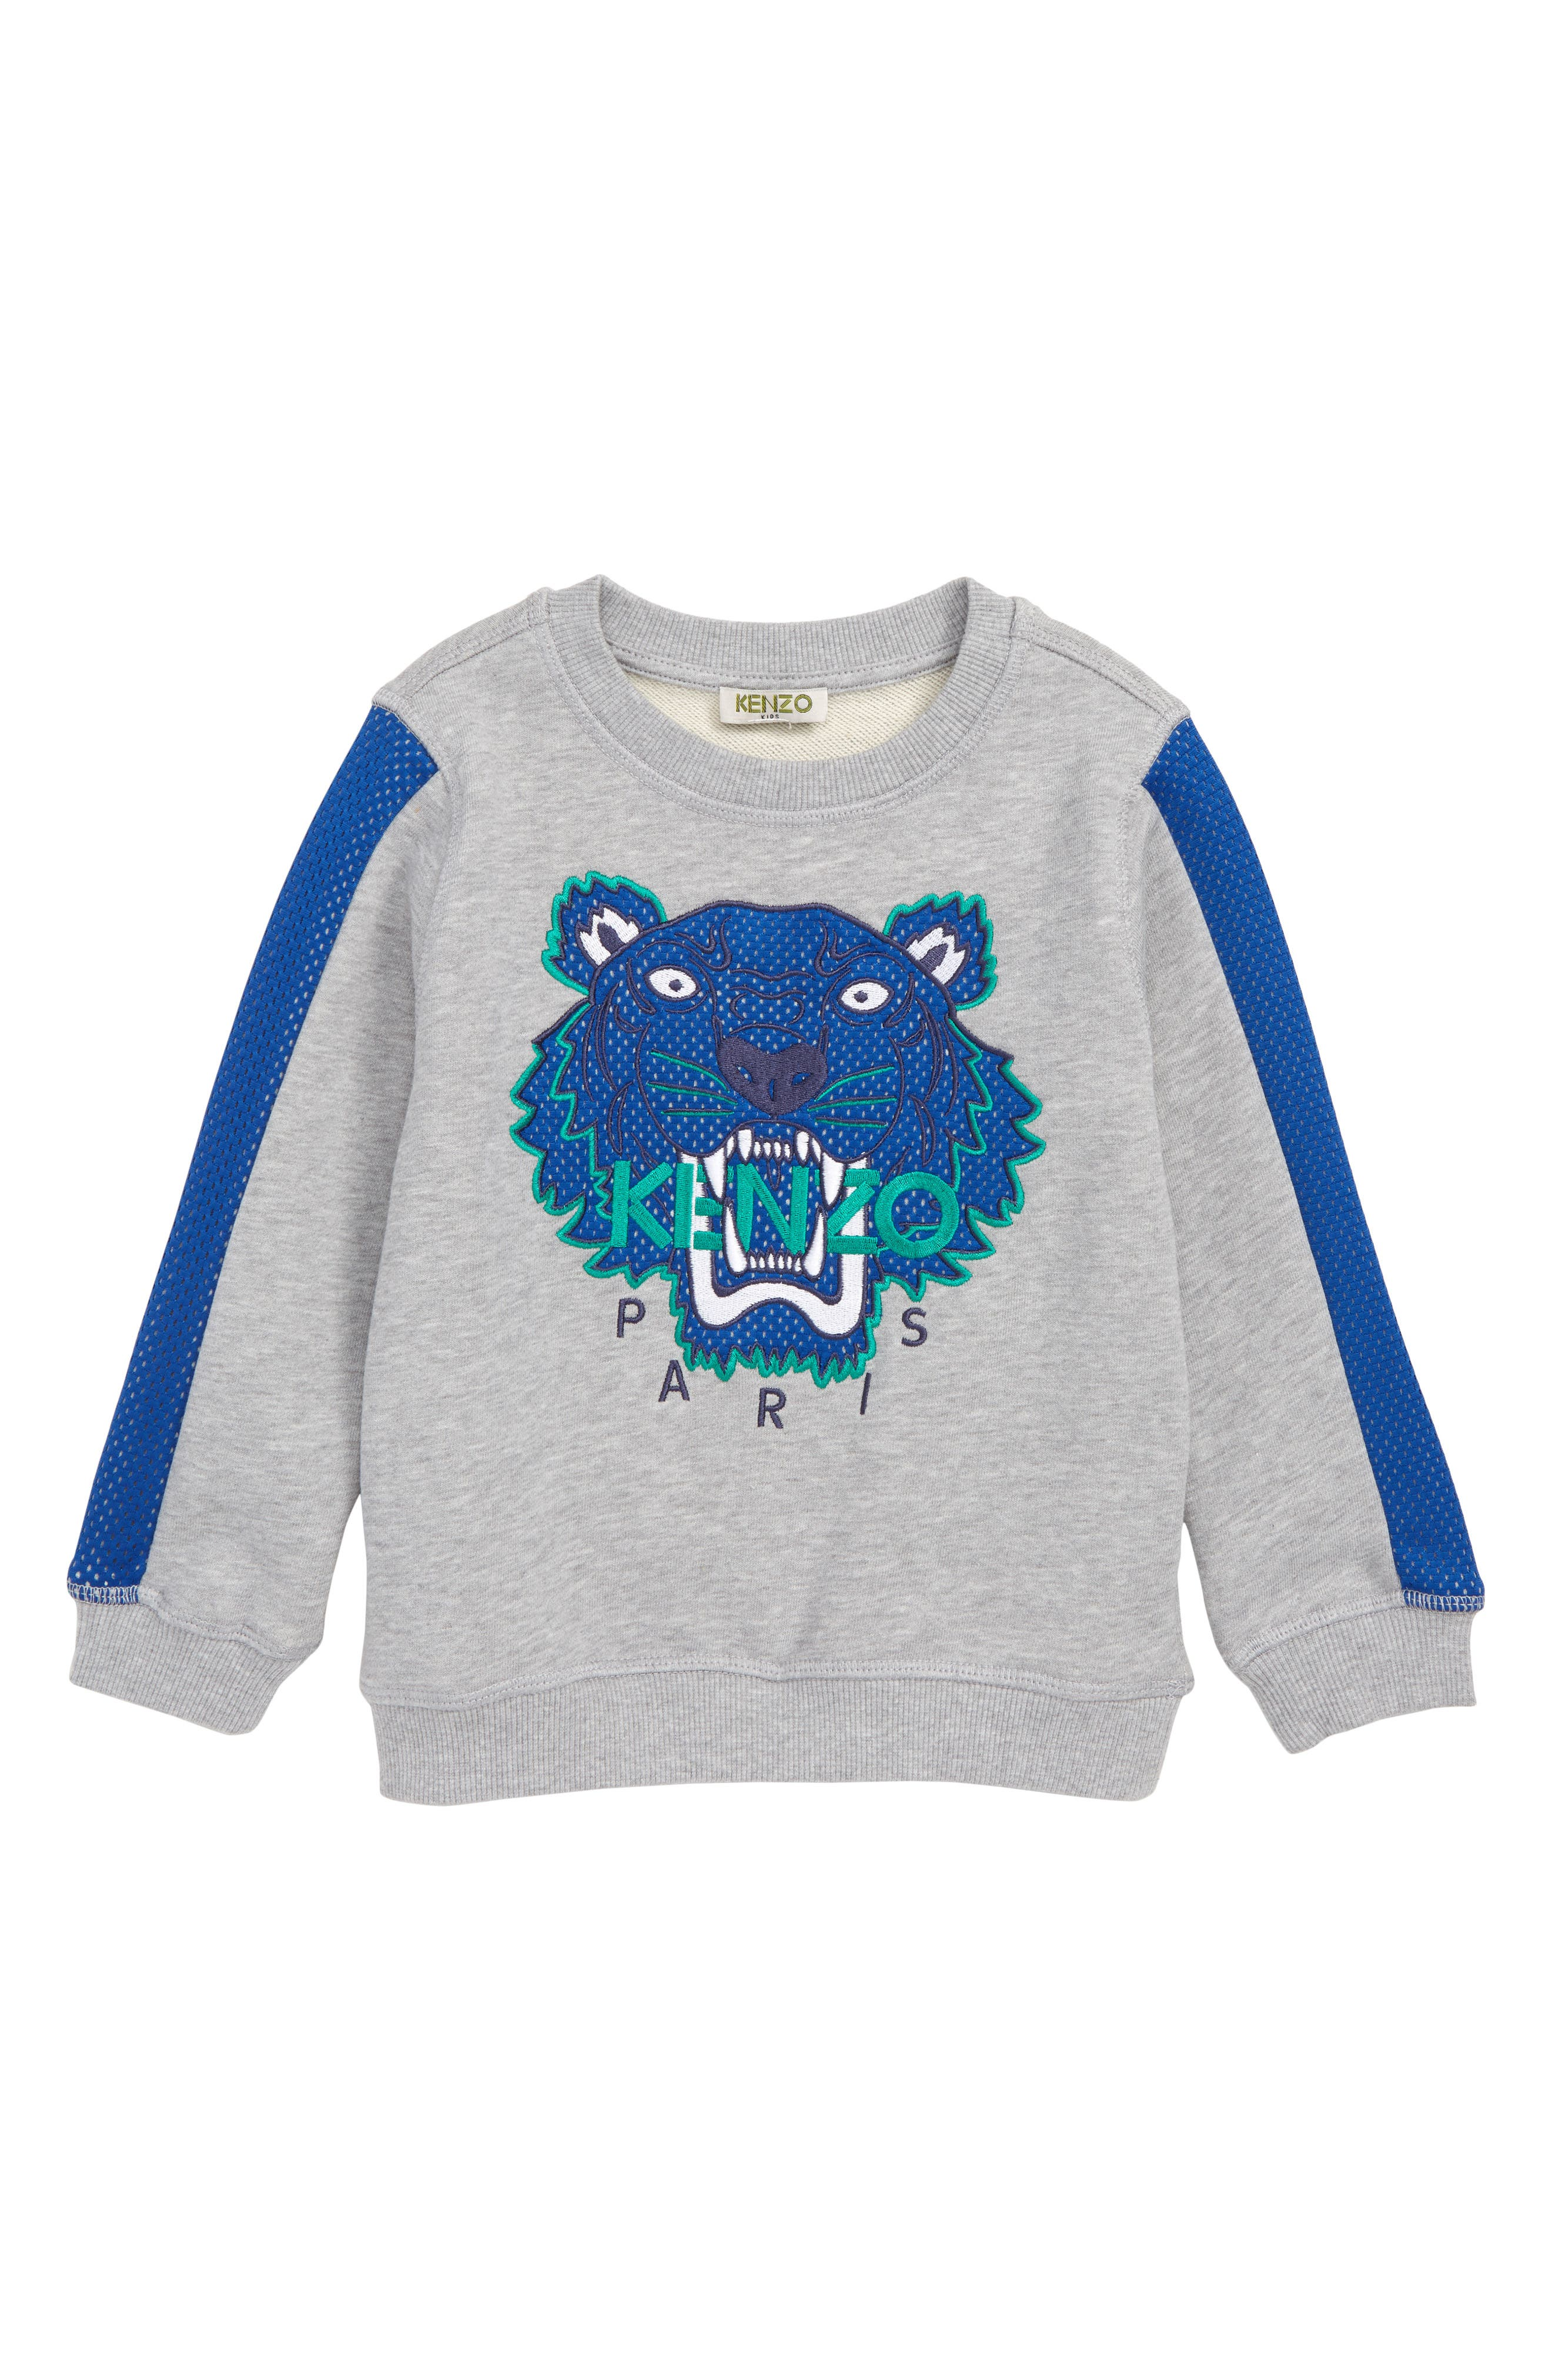 KENZO,                             Tiger Appliqué Sweatshirt,                             Main thumbnail 1, color,                             MARL GREY